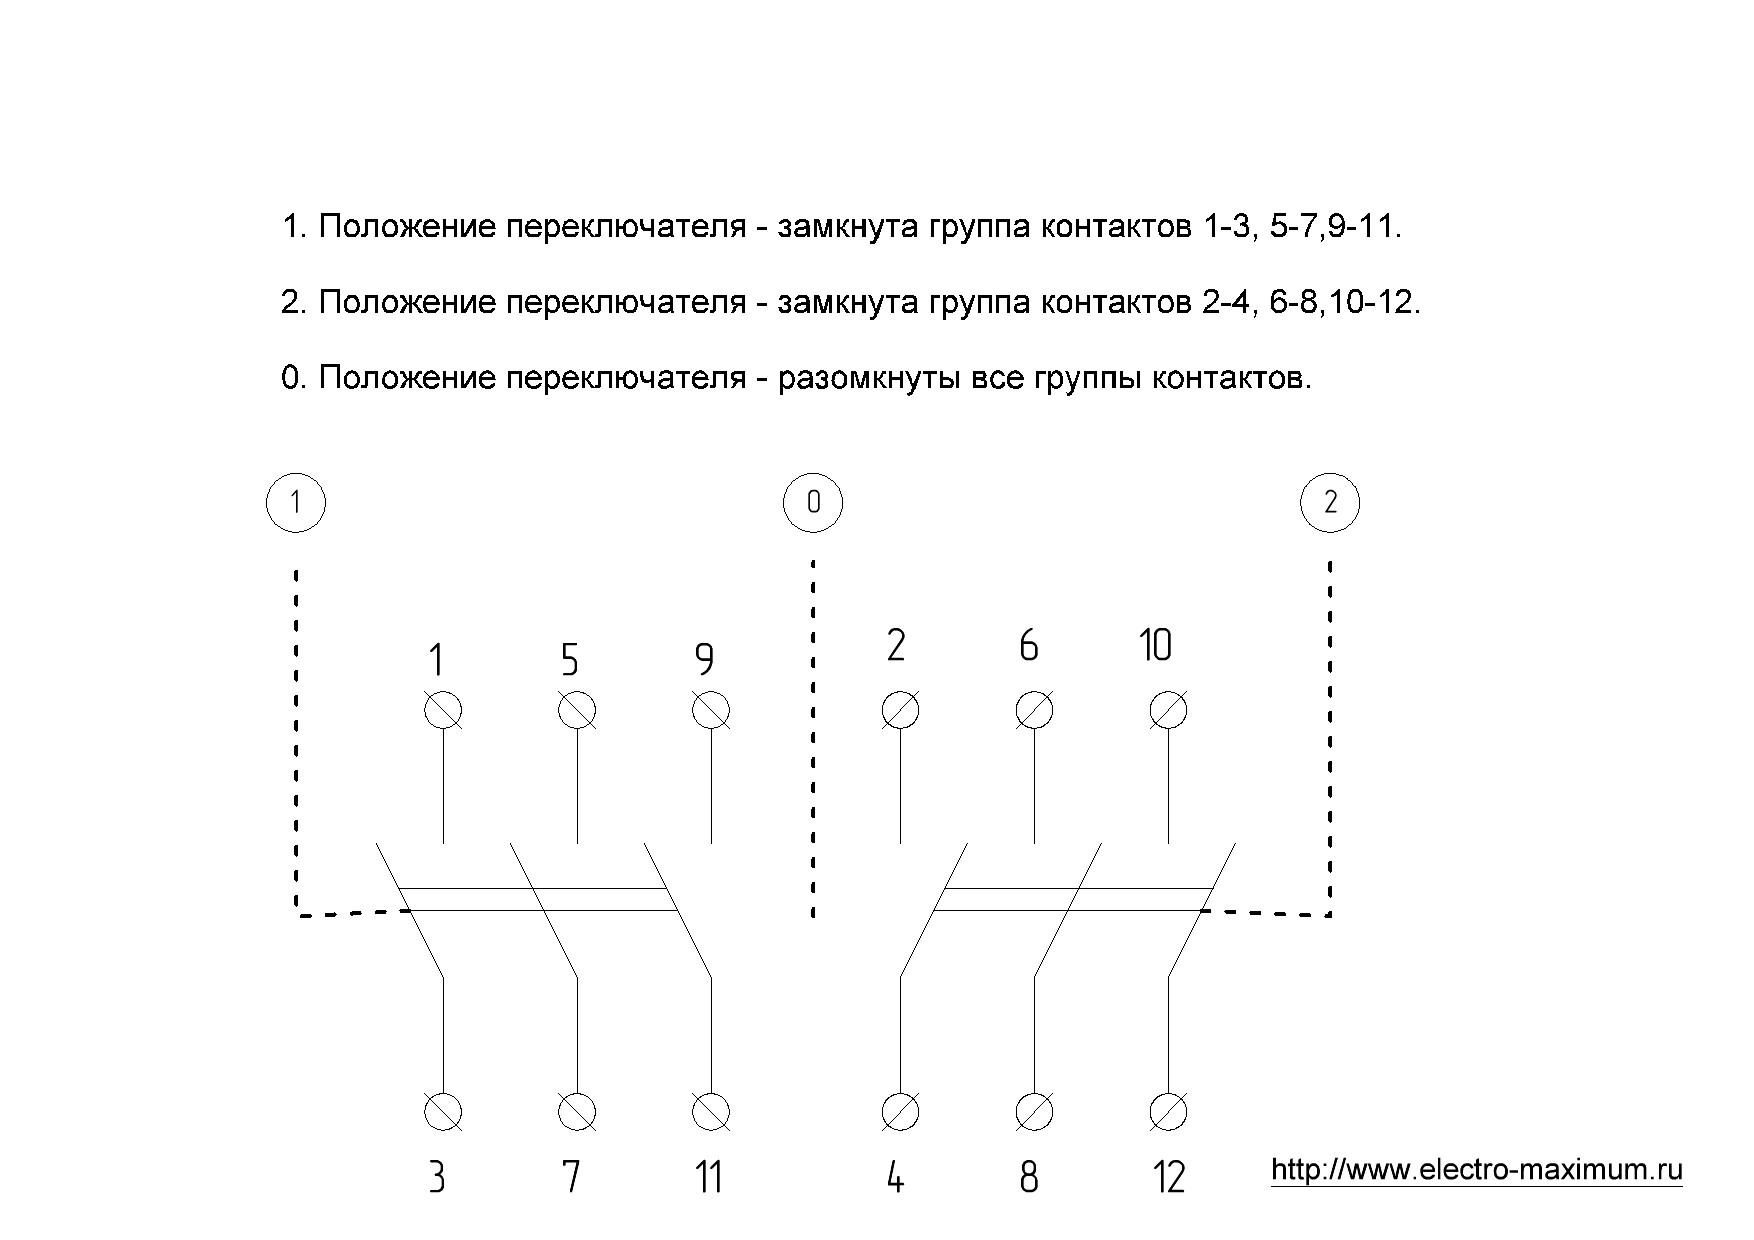 Cхема переключателя